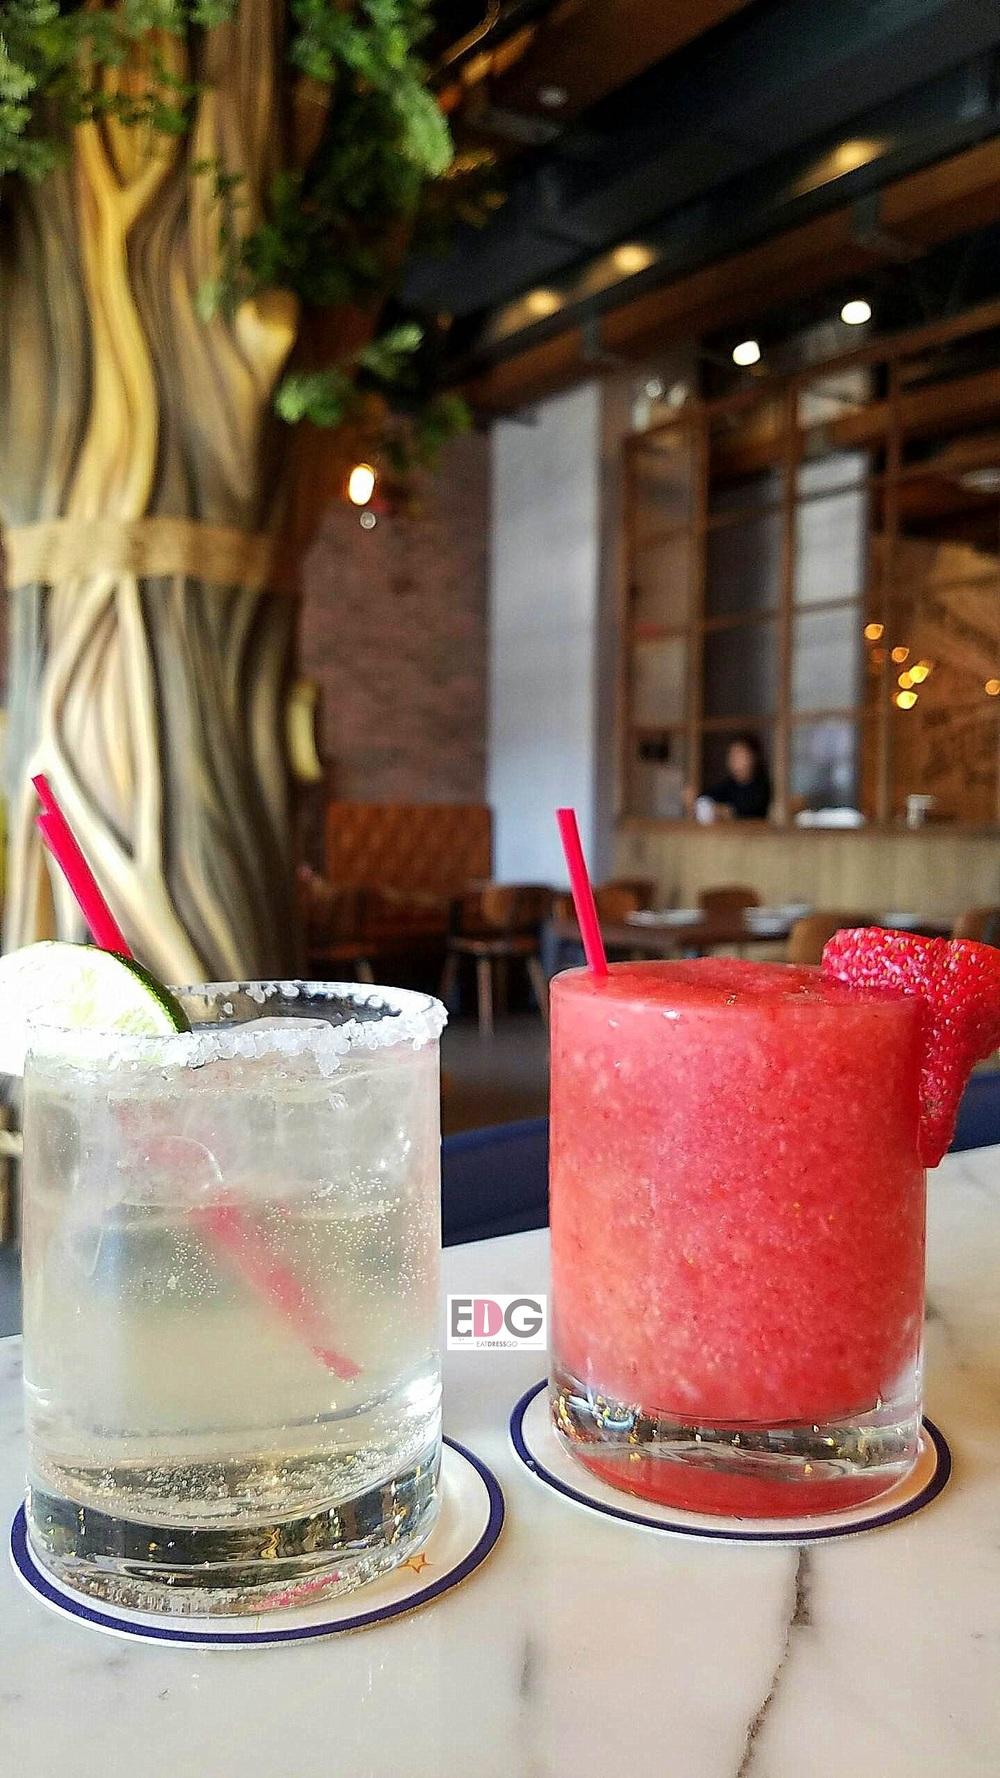 Pizzamaru_Margarita and Strawberry Daiquiri.jpg